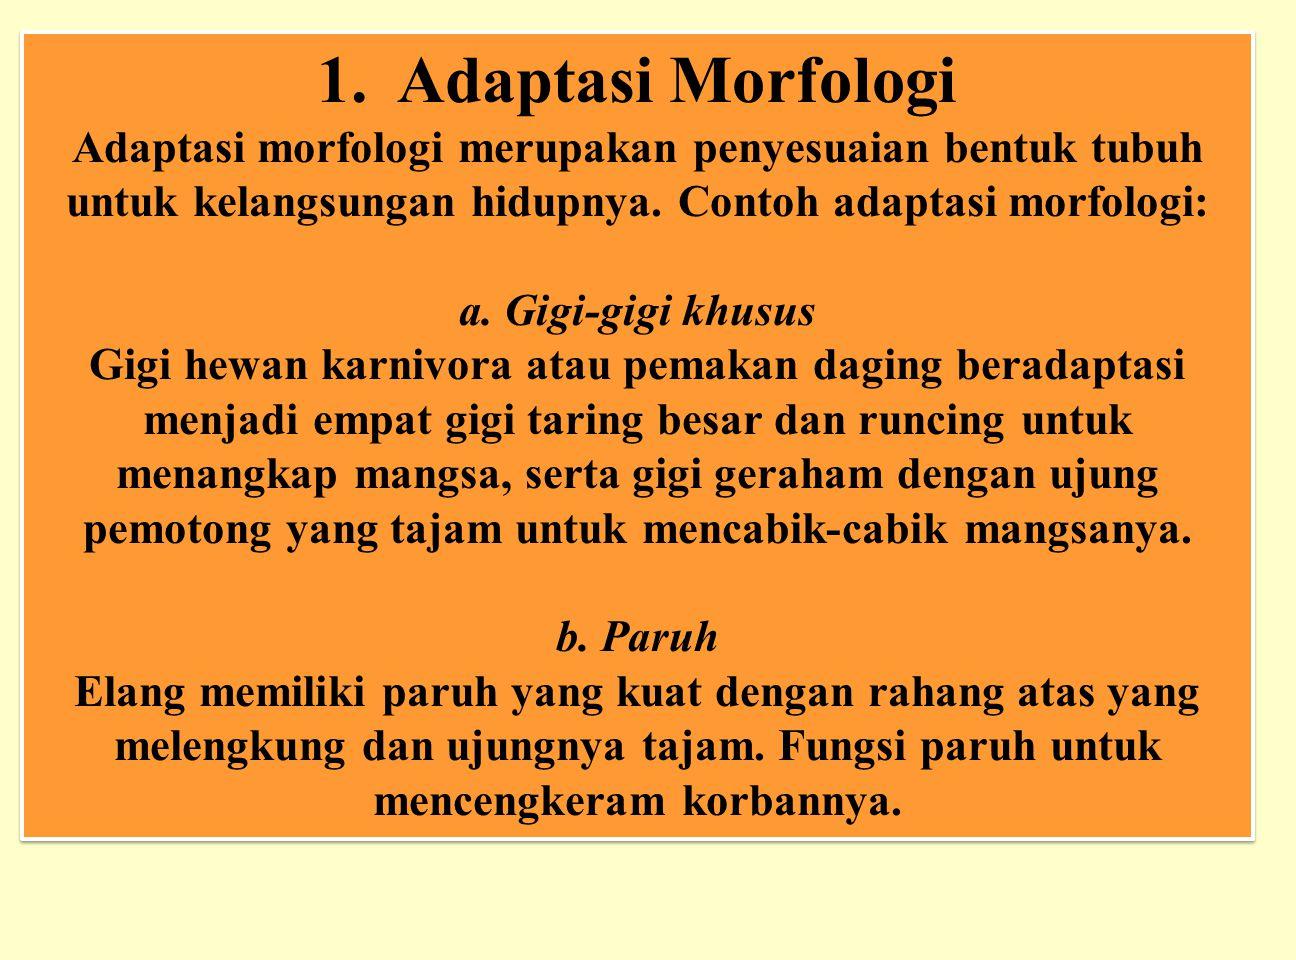 1. Adaptasi Morfologi Adaptasi morfologi merupakan penyesuaian bentuk tubuh untuk kelangsungan hidupnya. Contoh adaptasi morfologi: a. Gigi-gigi khusu